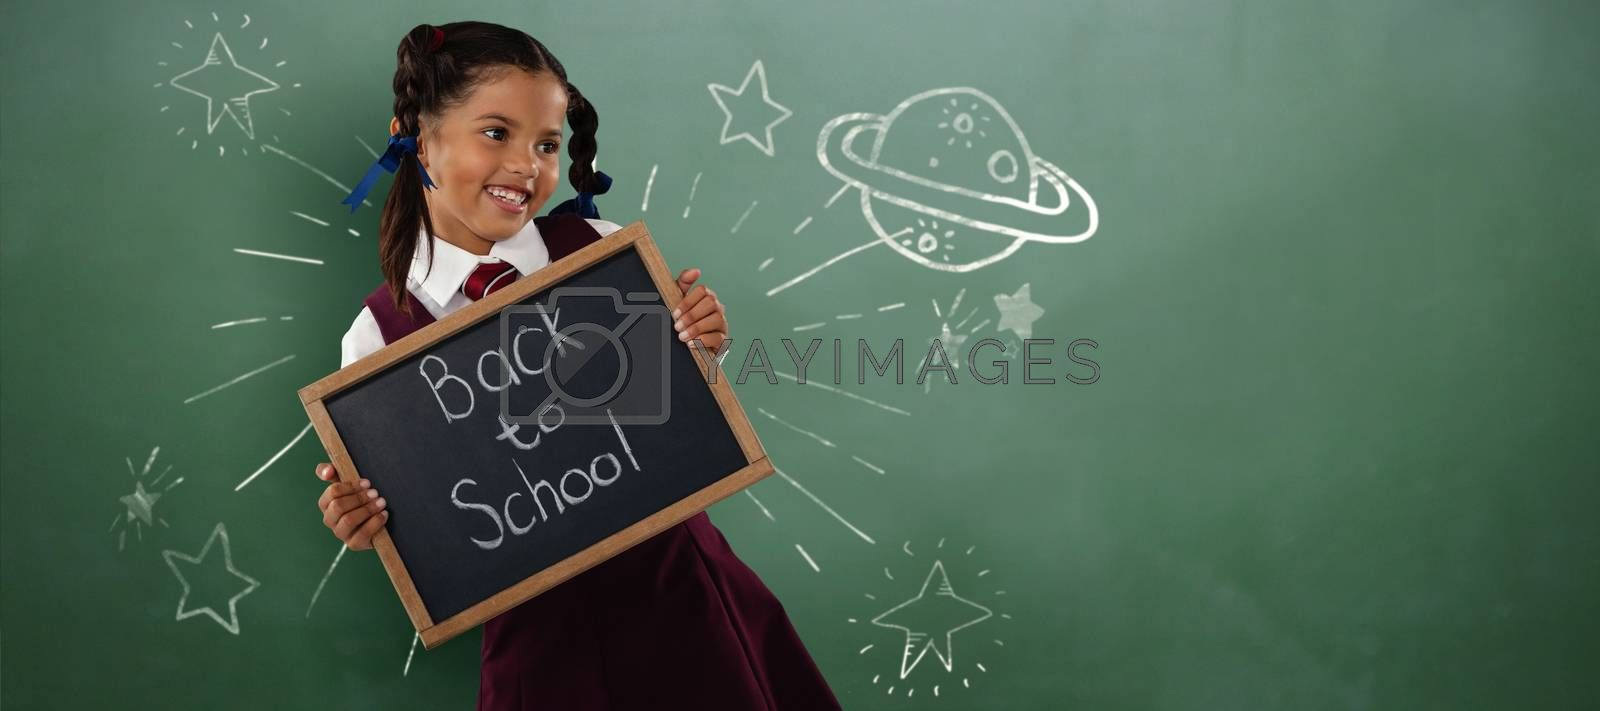 Composite image of smiling schoolgirl holding writing slate  by Wavebreakmedia